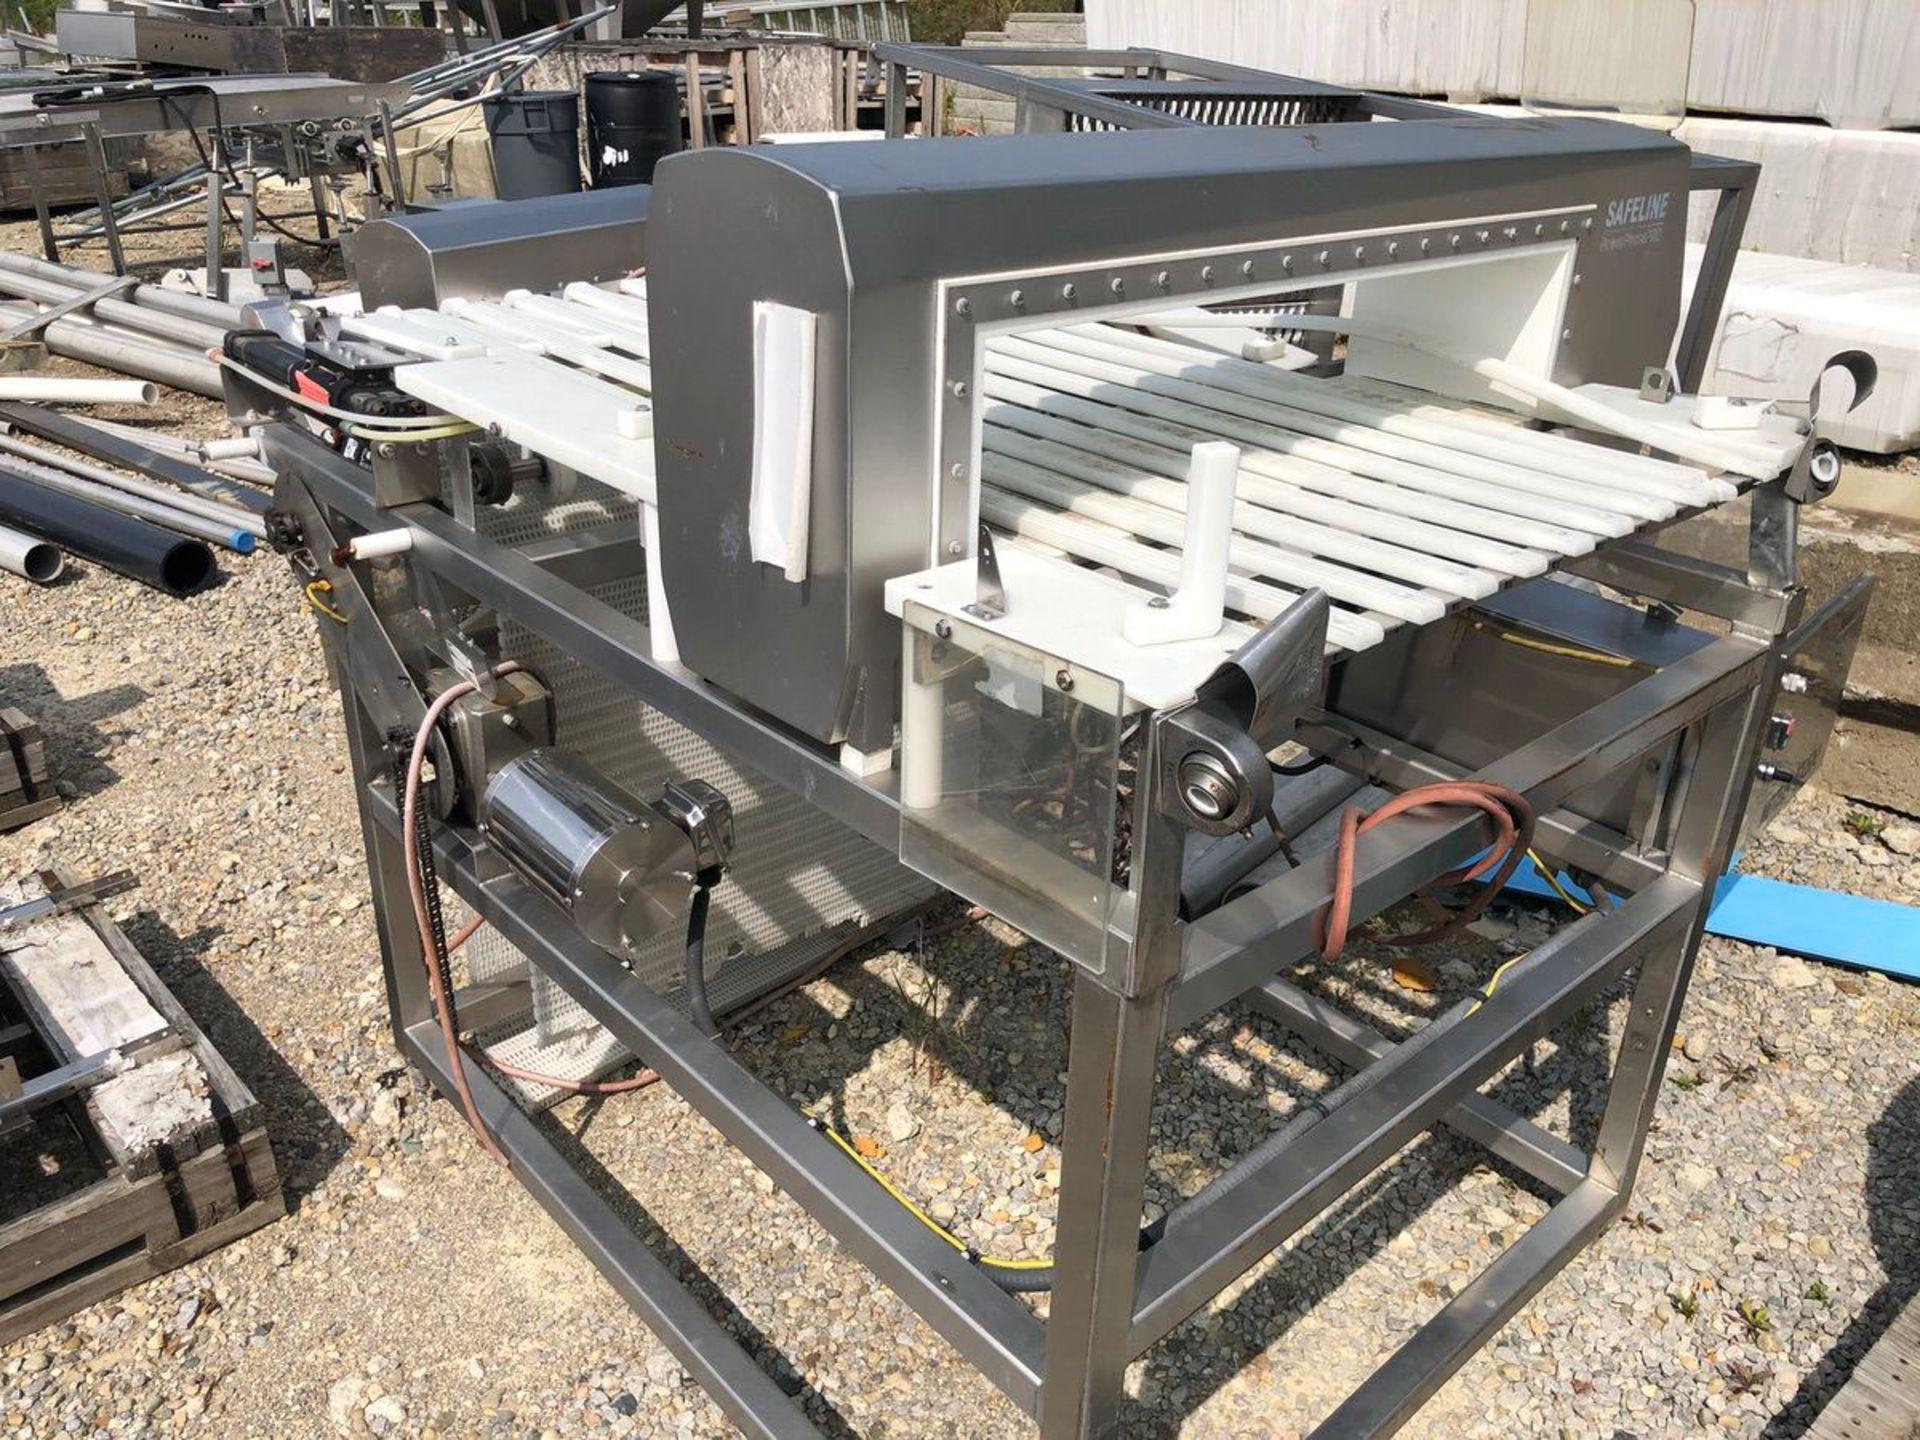 Safeline PowerPhasePro Metal Detector, Approx Aperture 36in W x 7in C | Rig Fee: $150 See Full Desc - Image 3 of 4